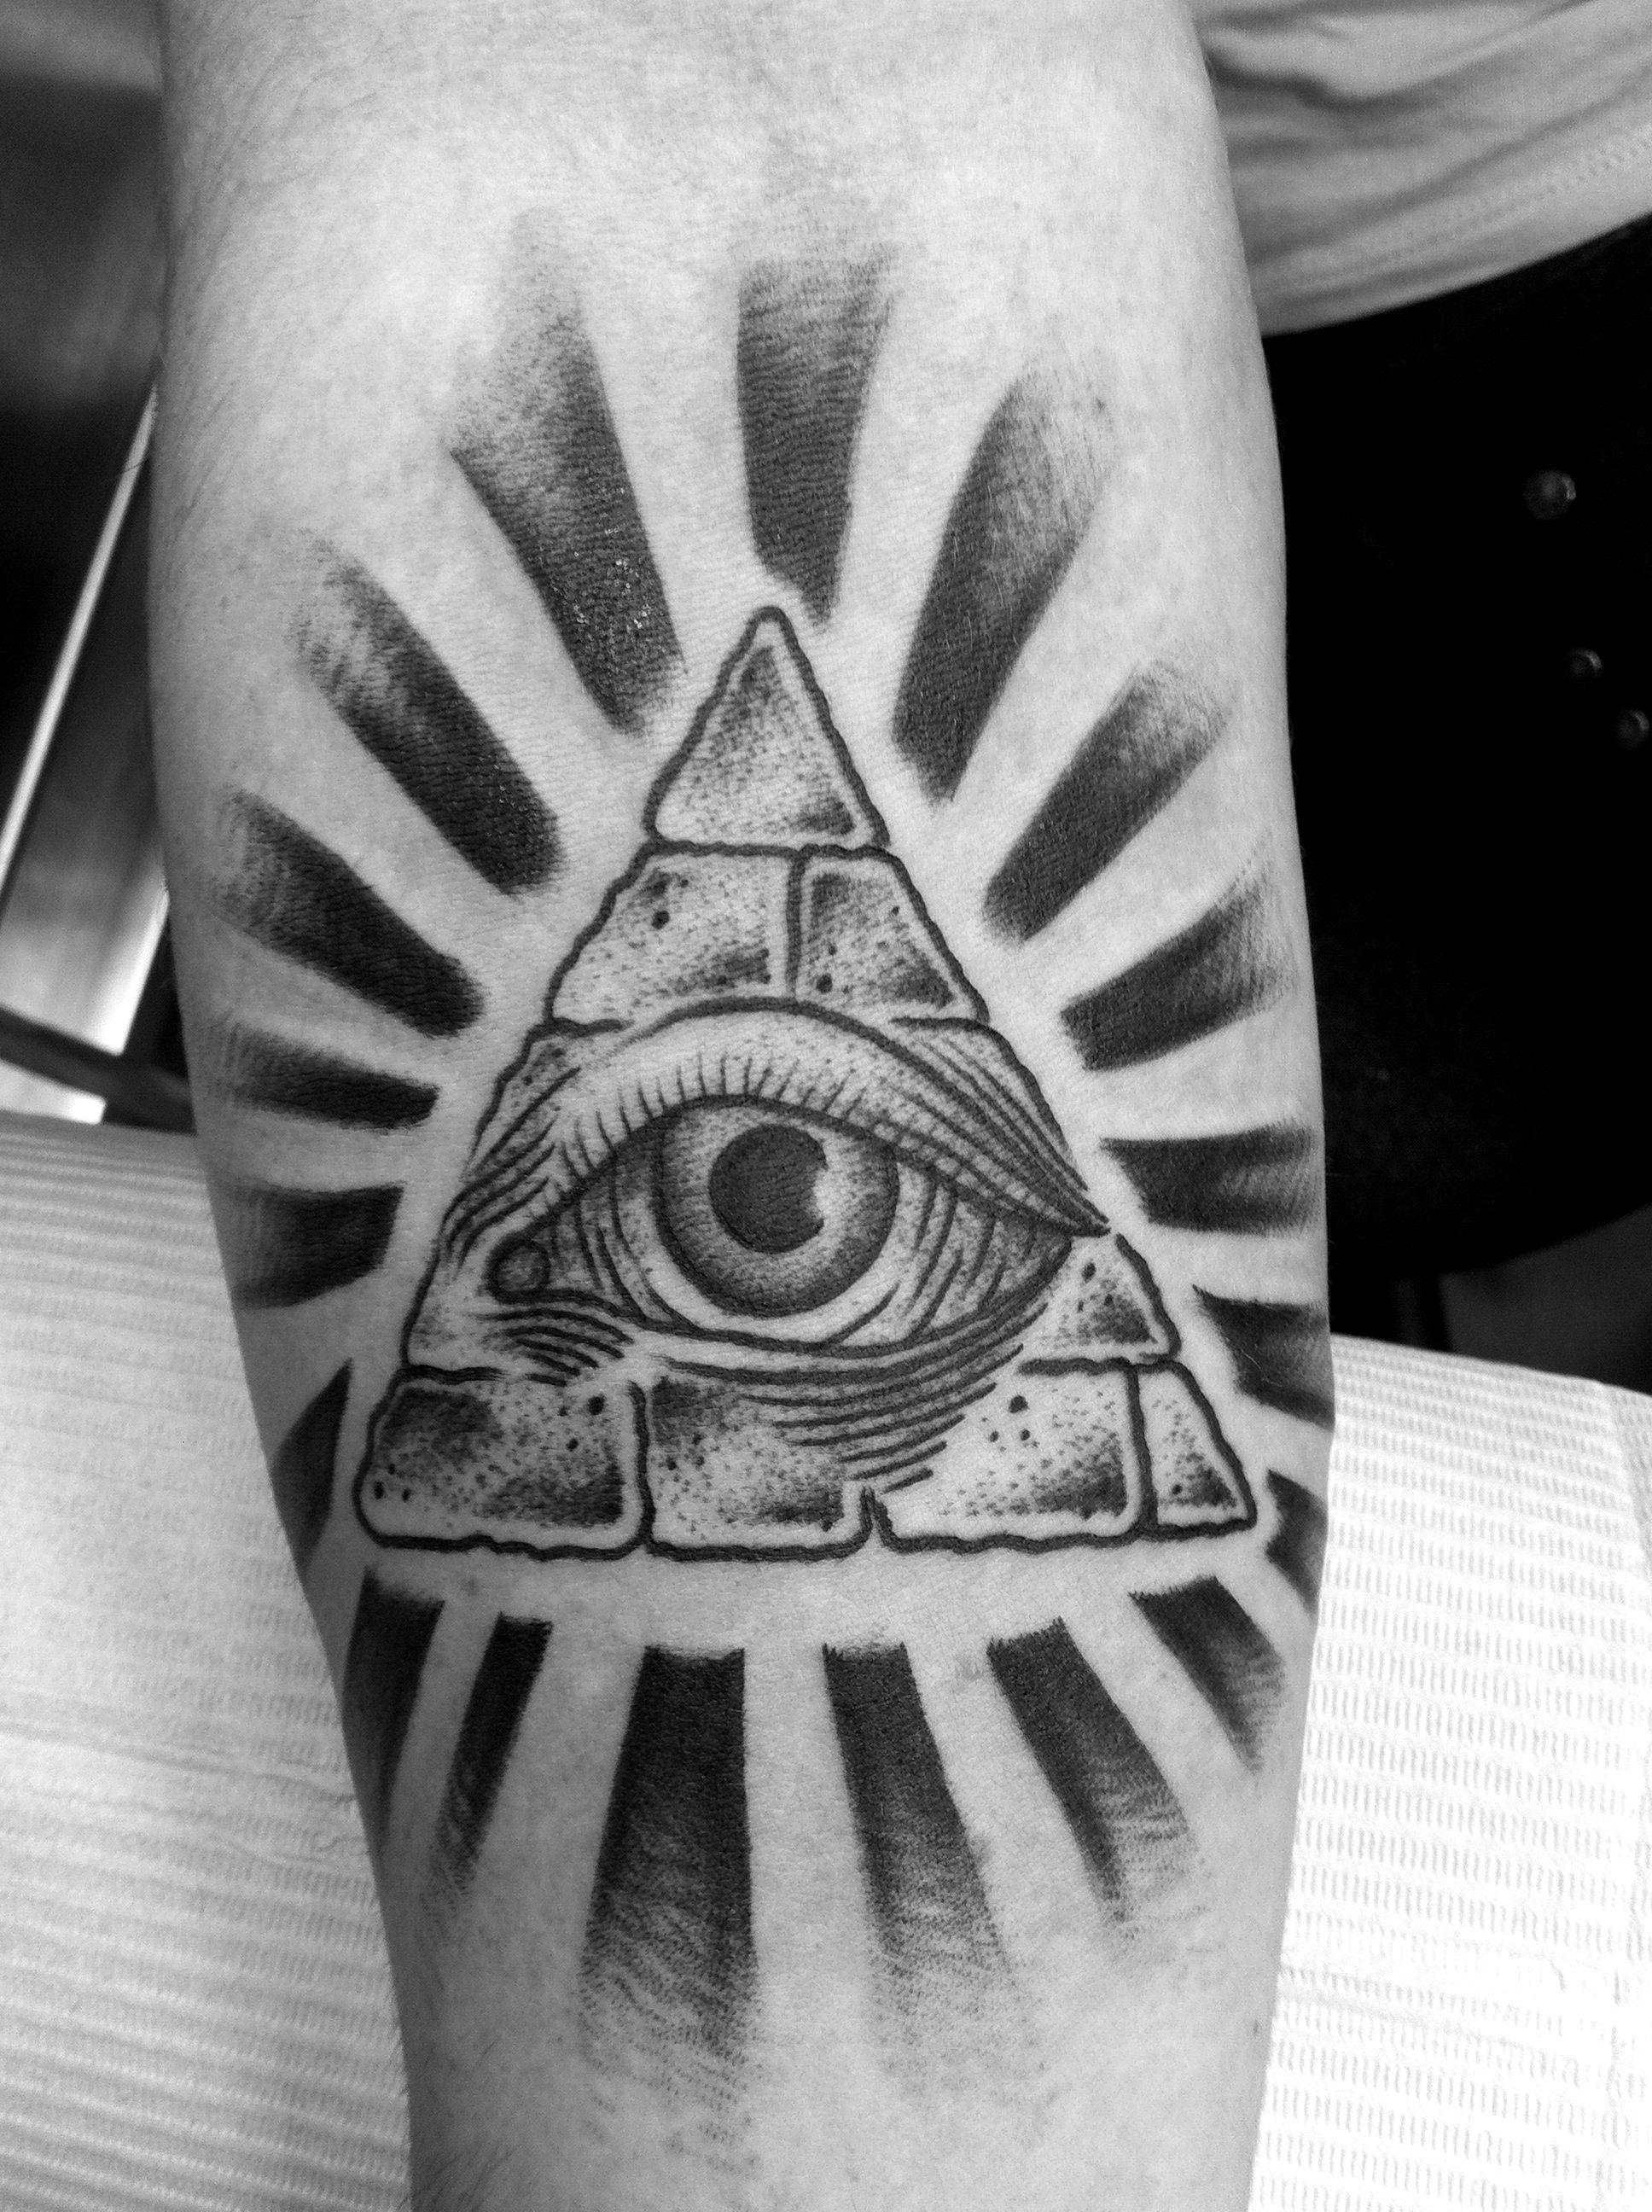 9ab9c7467cfe7 All Seeing Eye Tattoo On Back Neck photo - 2 | Tattoos | Illuminati ...